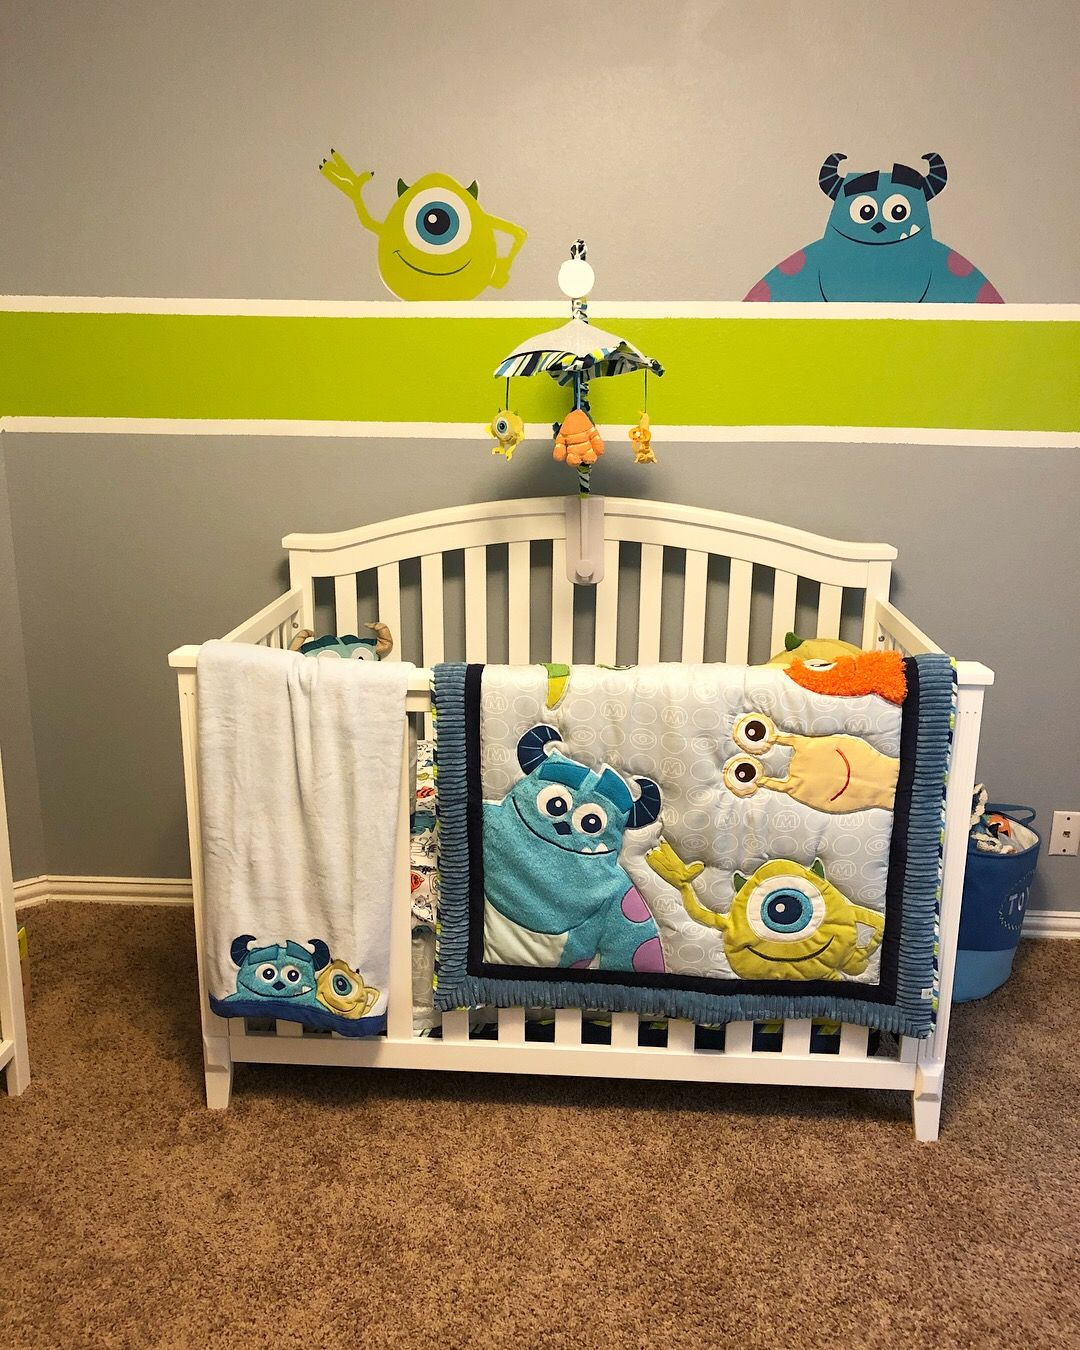 Lincoln S Monsters Inc Themed Nursery Monstersinc Nursery Disney Nursery Themes Monsters Inc Nursery Nursery Room Boy